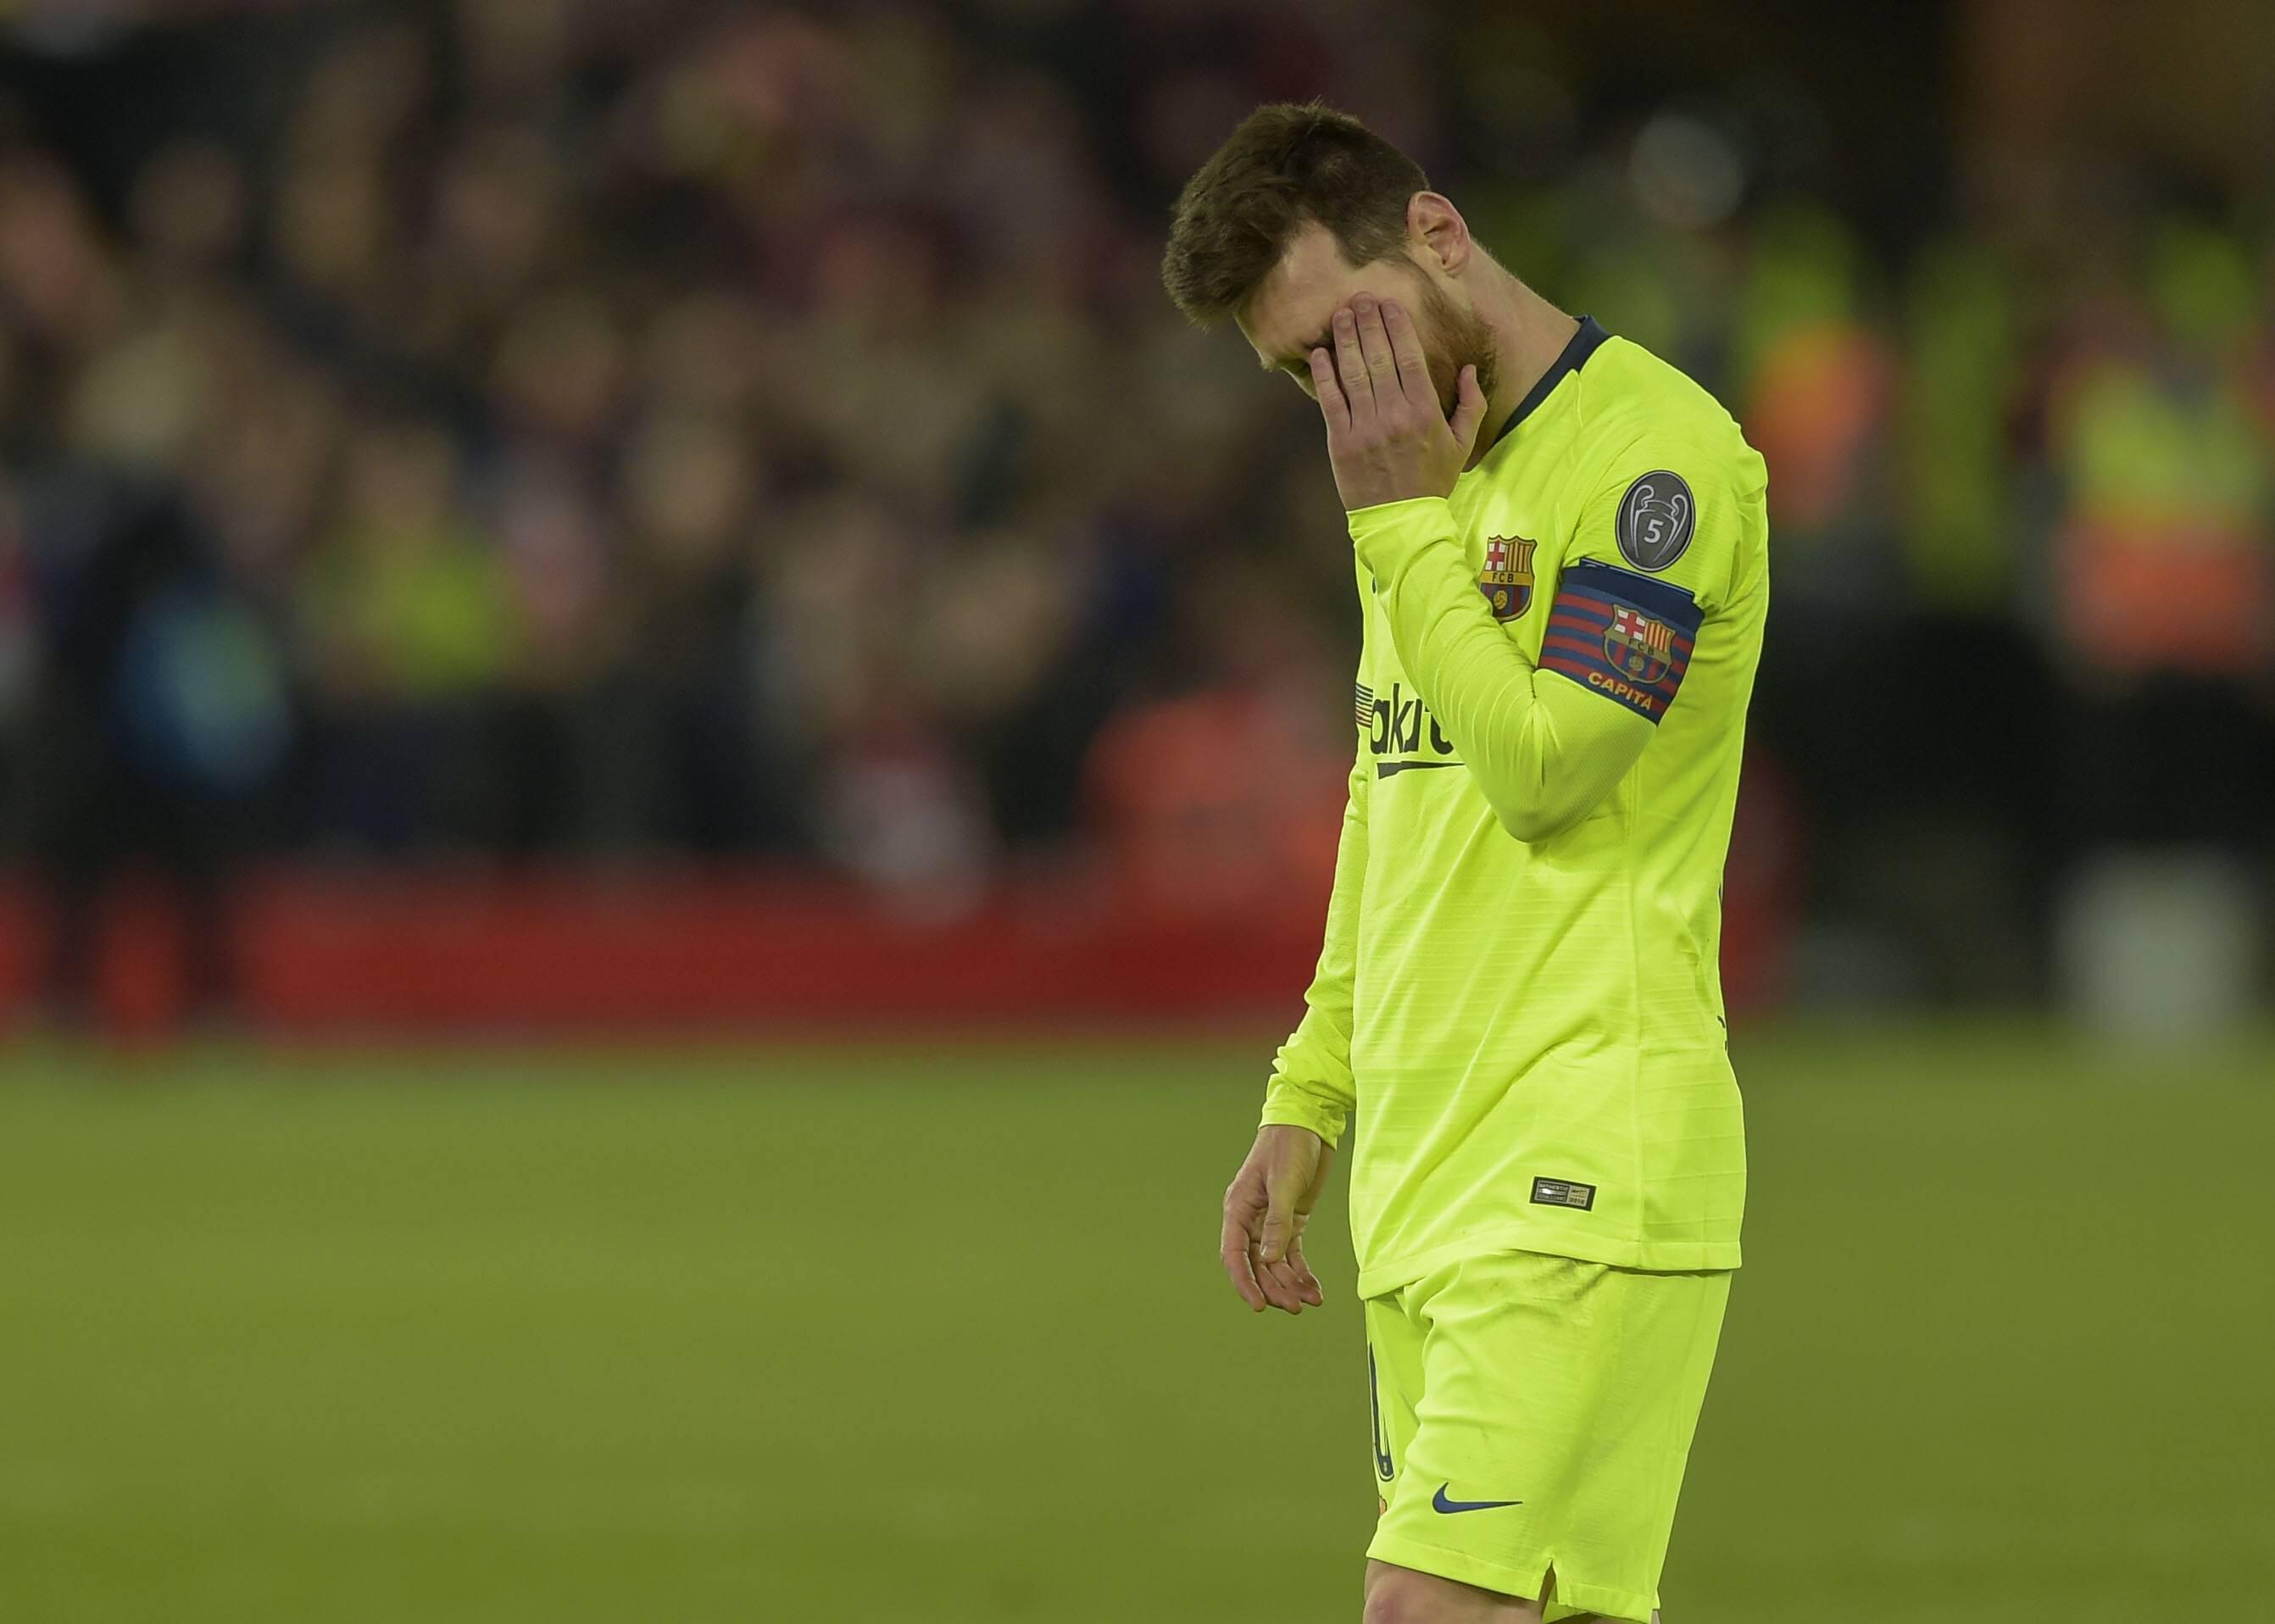 Bild zu FC Liverpool, FC Barcelona, Champions League, Halbfinale, Lionel Messi, Enttäuschung